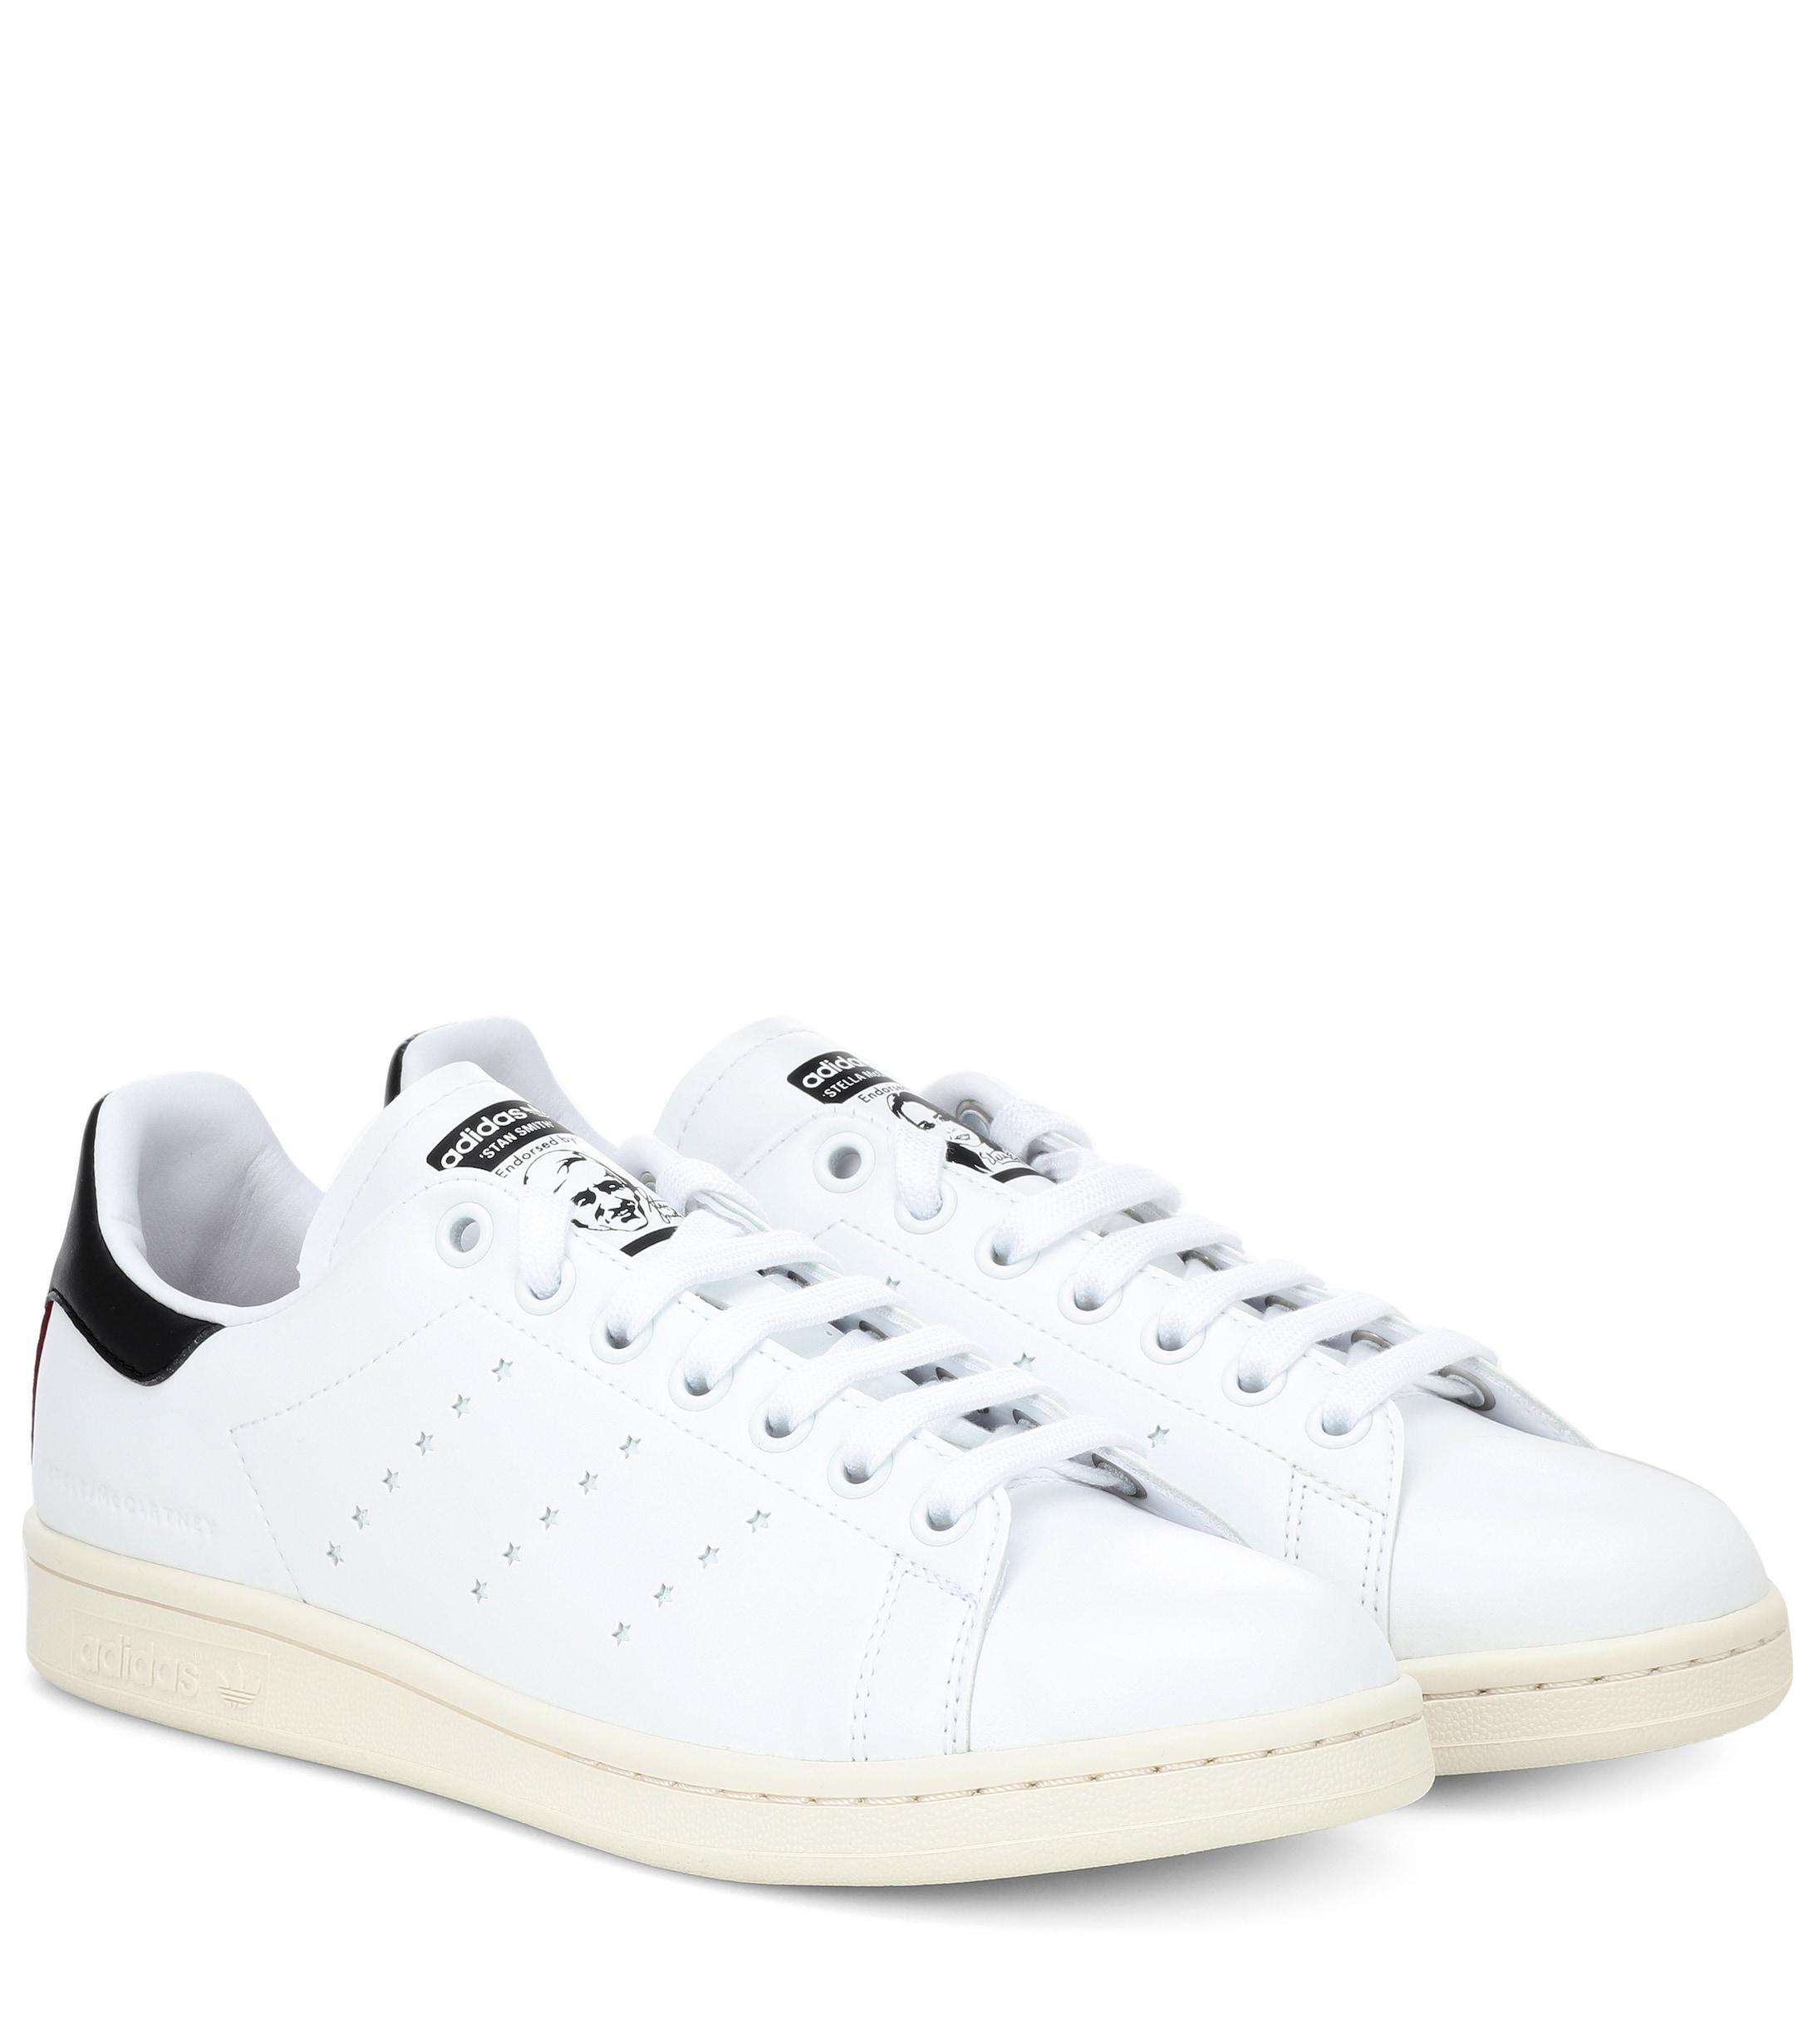 e09532489a88 Stella McCartney Stan Smith Sneakers in White - Lyst